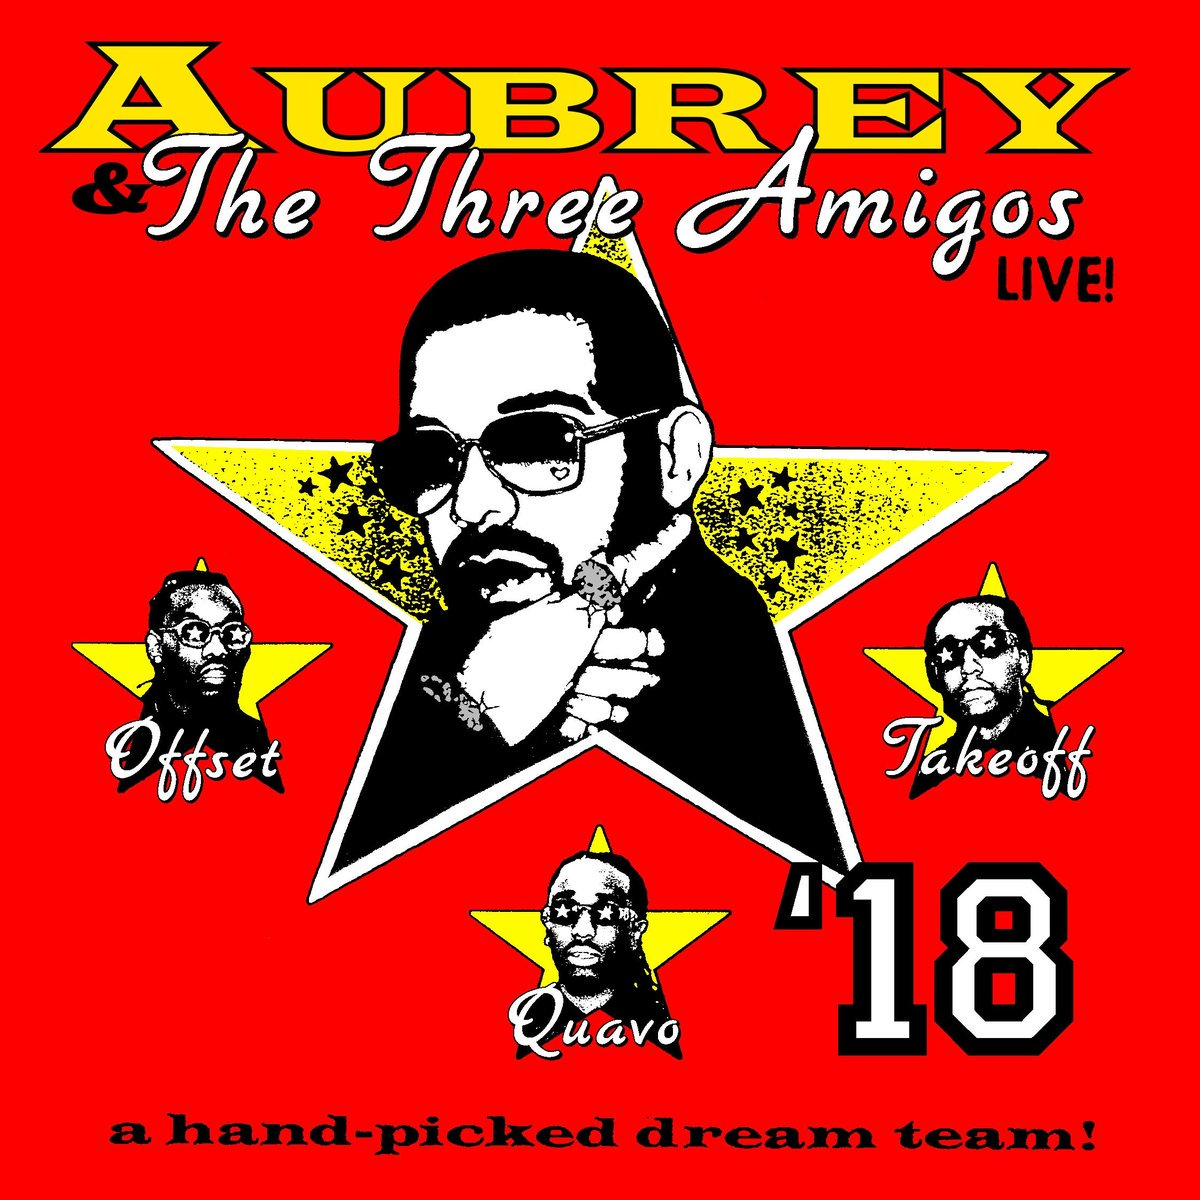 .@Drake and @Migos Announce 'Aubrey & The Three Amigos' Tour https://t.co/mqbqi0t1dJ https://t.co/O4cYMbfZa8